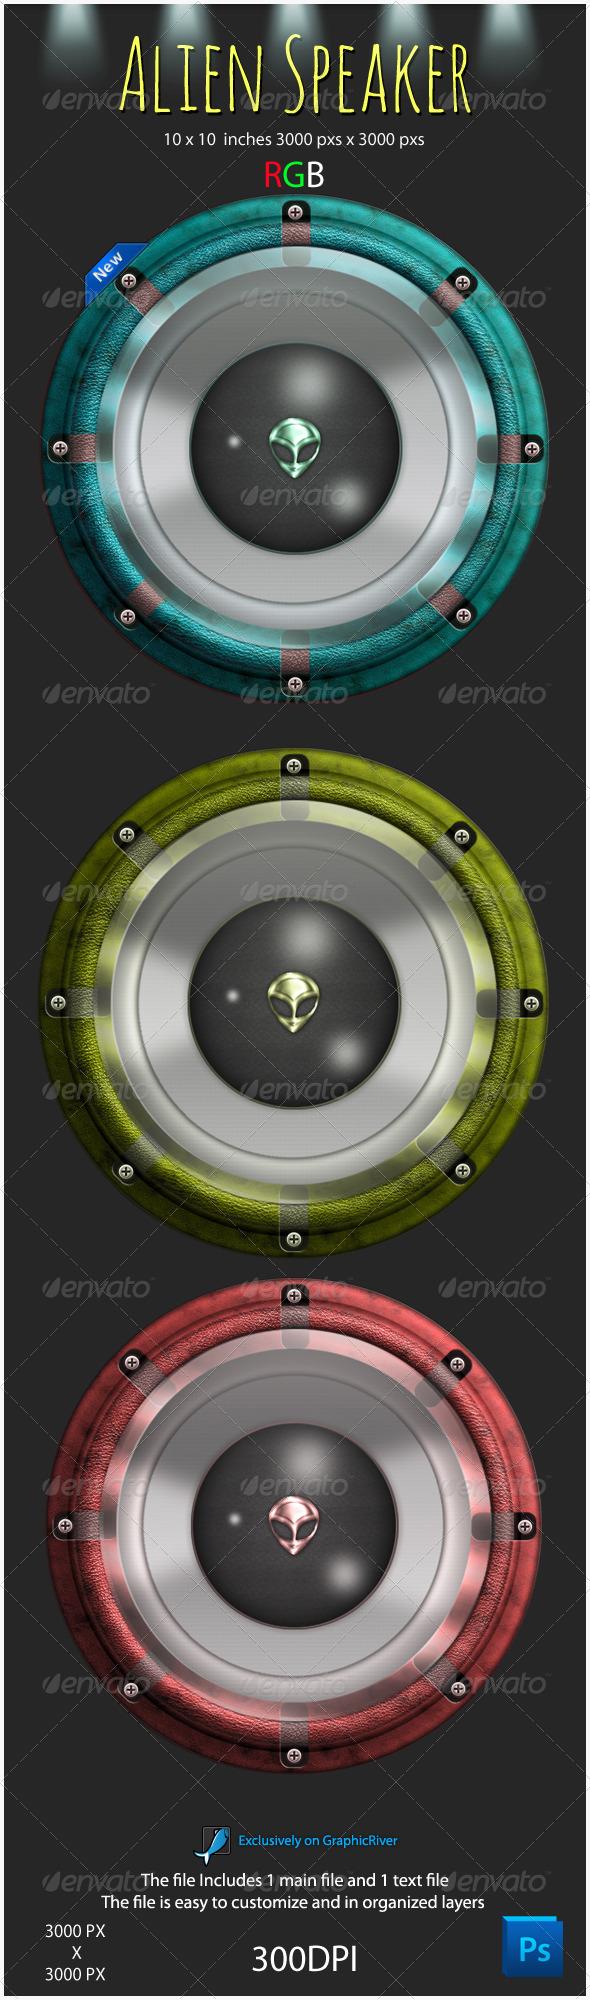 Alien Speaker Graphic - Objects Illustrations